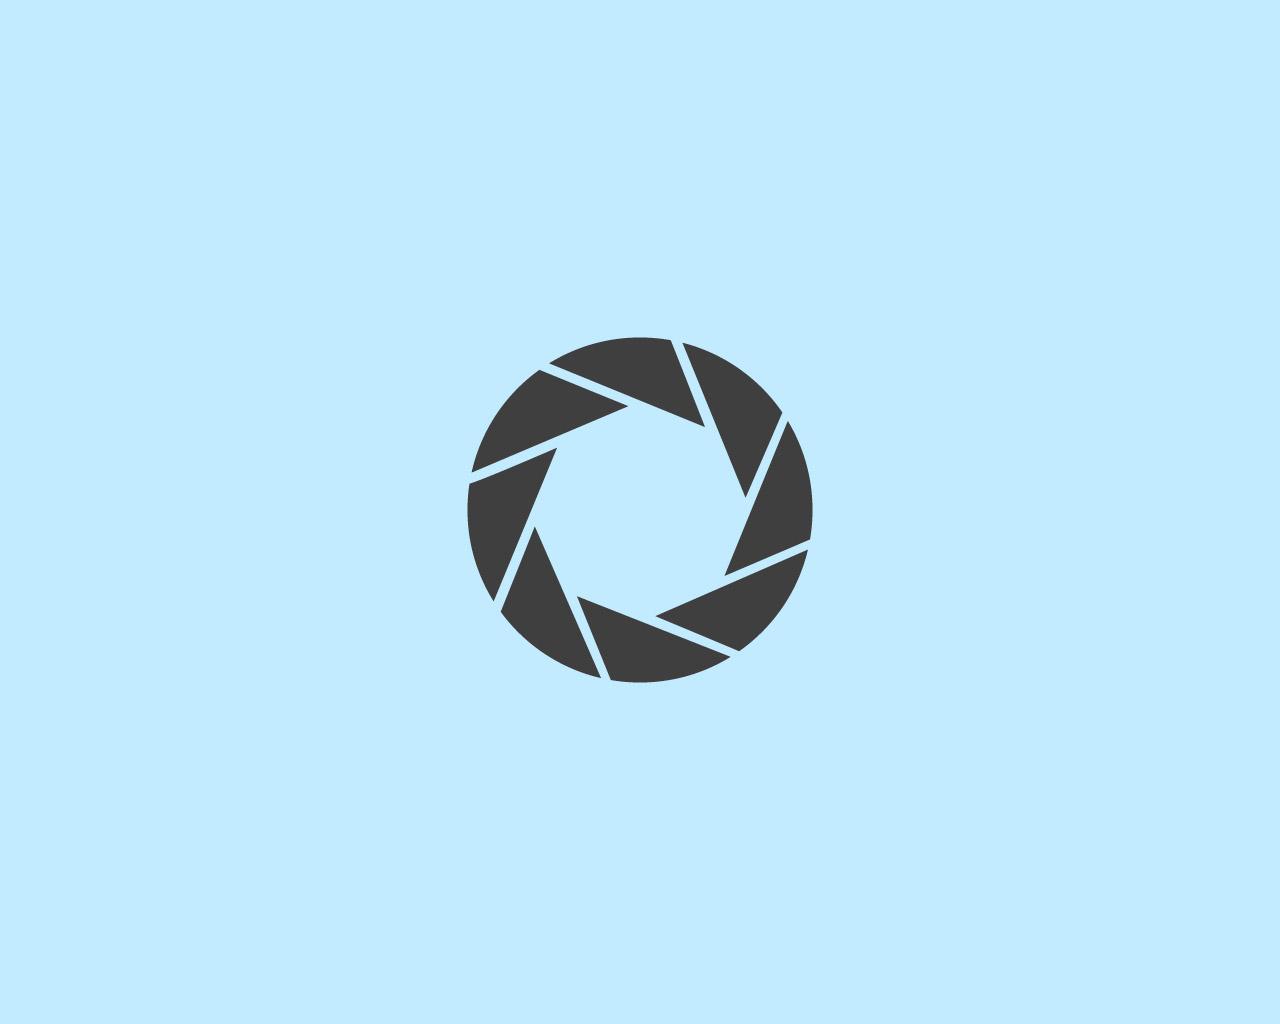 Free Portal Wallpaper in 1280x1024